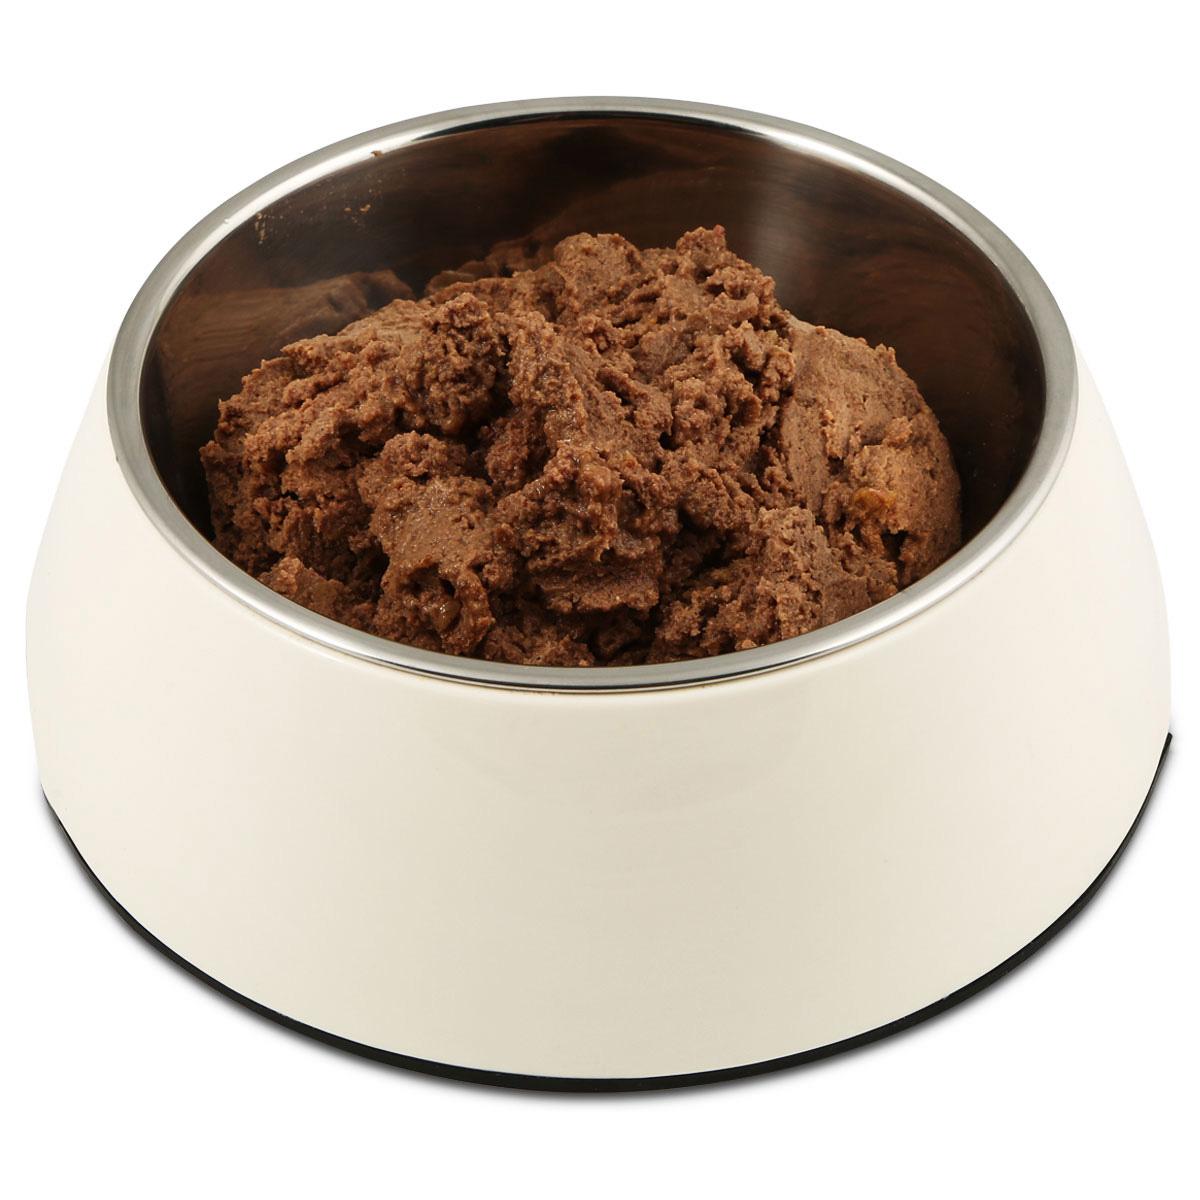 royal canin vet diet nassfutter satiety weight management. Black Bedroom Furniture Sets. Home Design Ideas